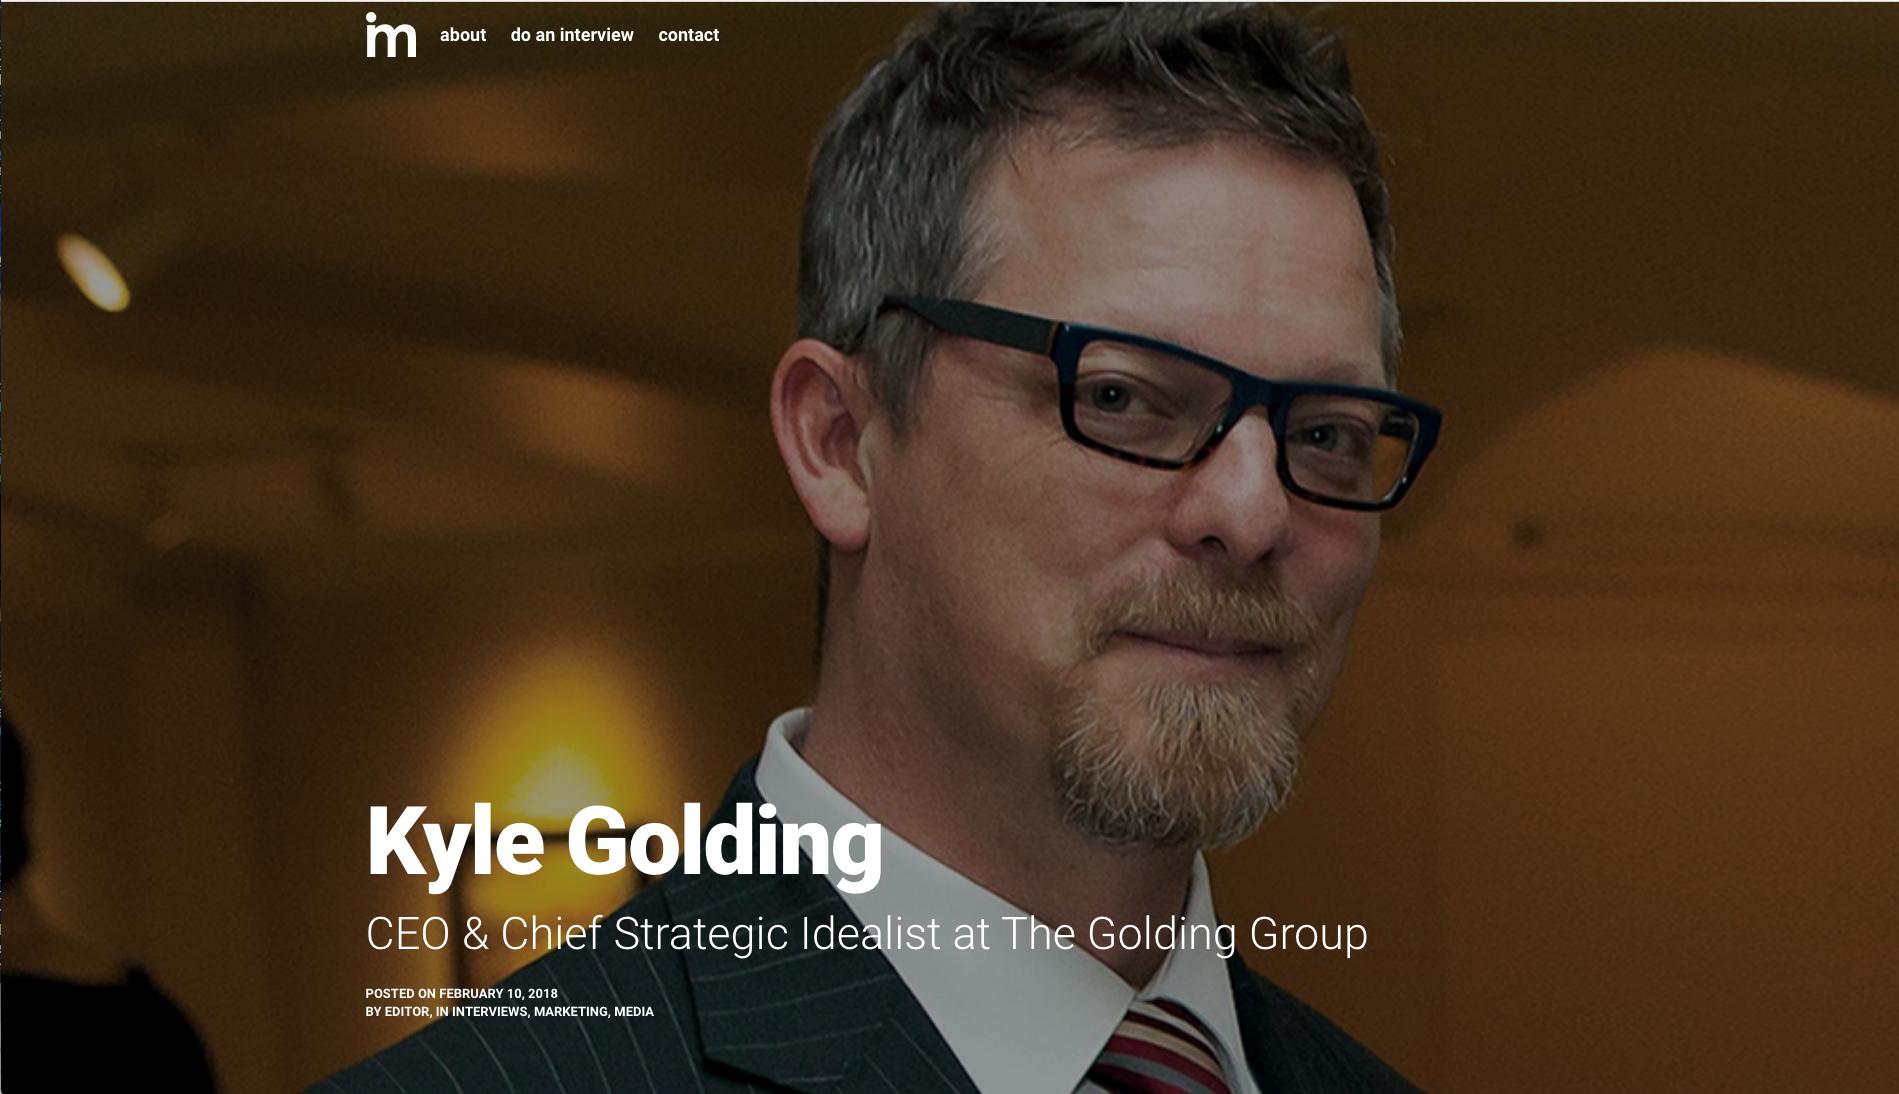 Kyle Golding Interview on Idea Mensch